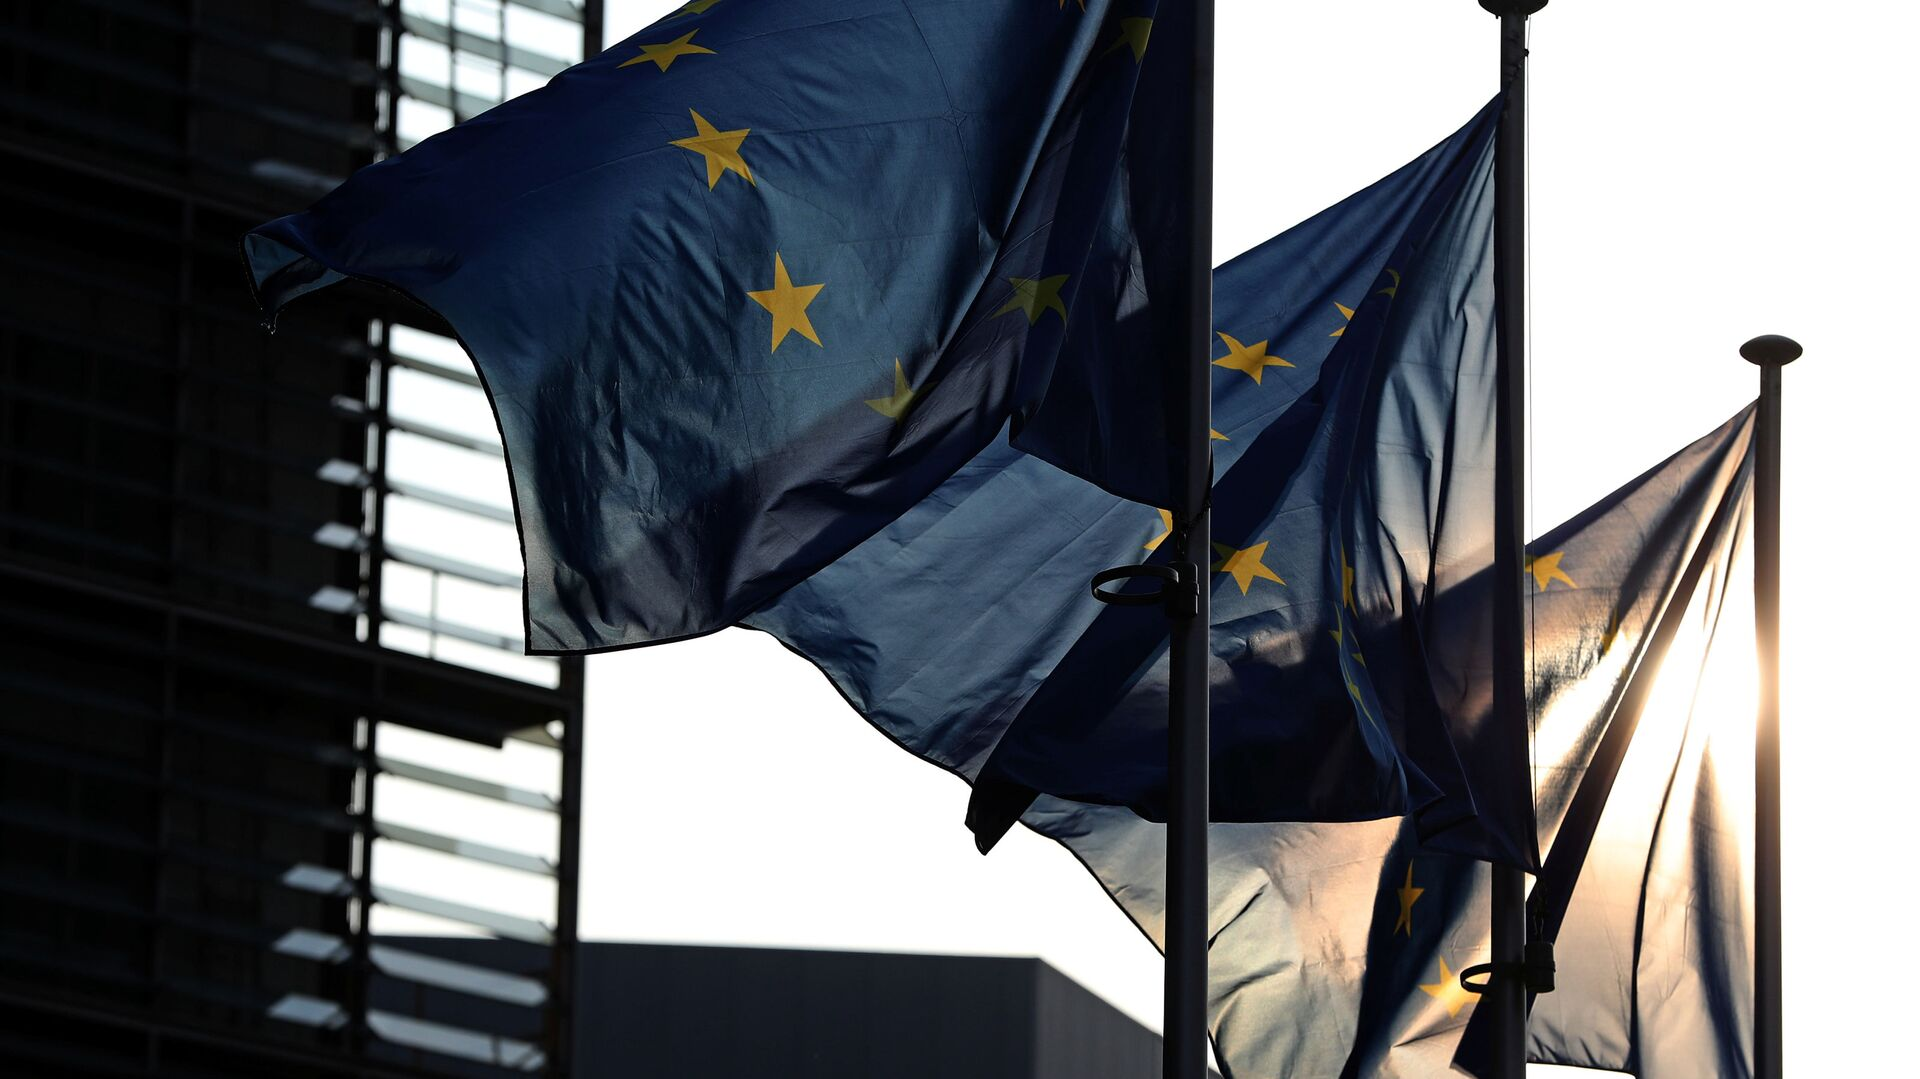 Vlajky EU v Bruselu - Sputnik Česká republika, 1920, 21.09.2021